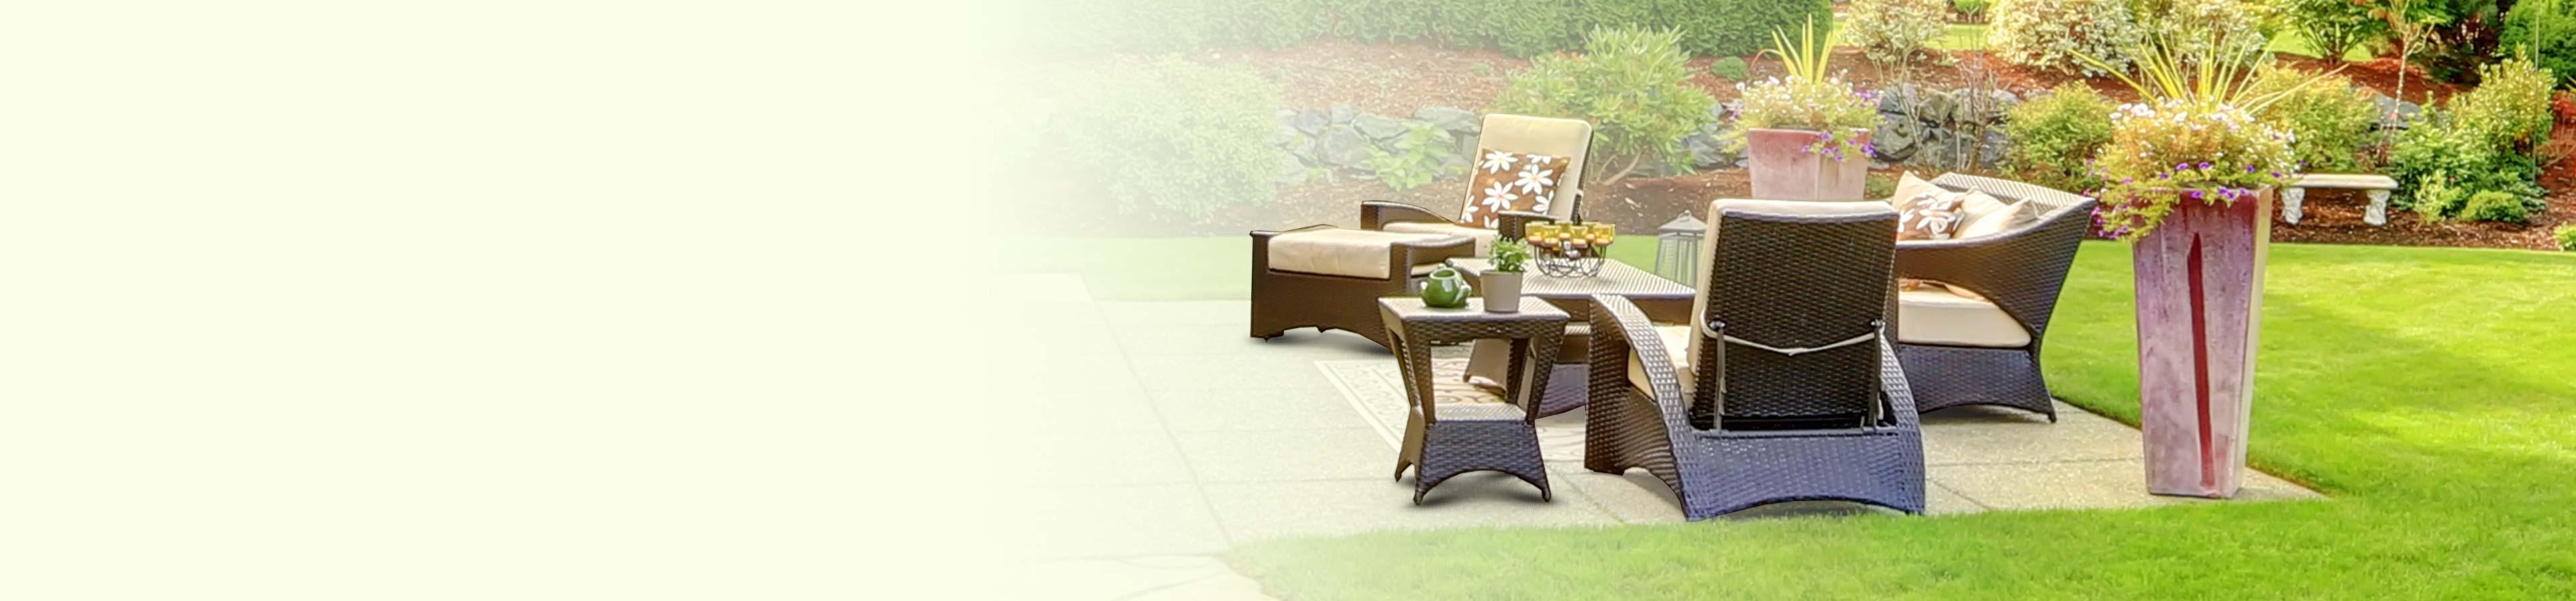 Picture of: Patio Furniture Outdoor Garden Balcony Furniture Best Buy Canada